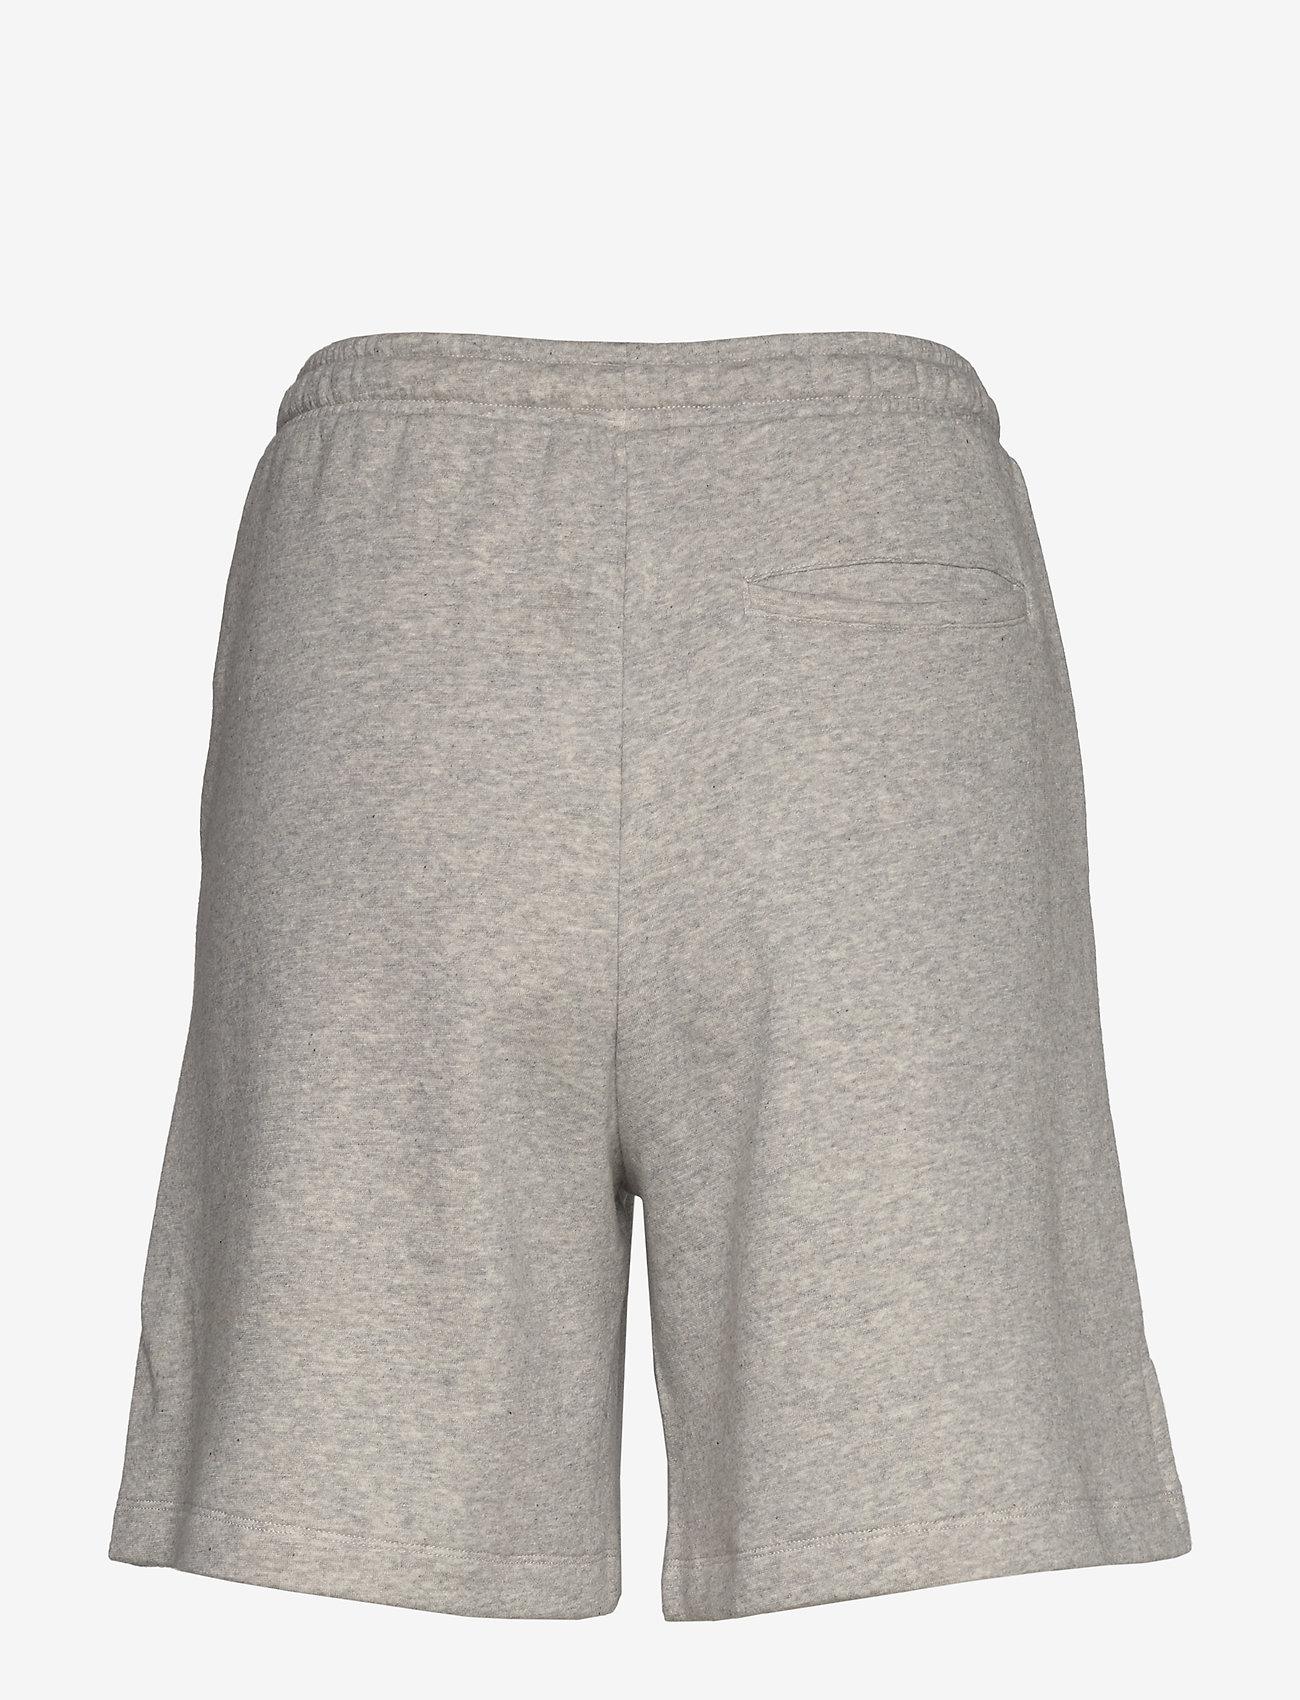 Fall Winter Spring Summer - Daniela Shorts - casual shorts - light gray - 1